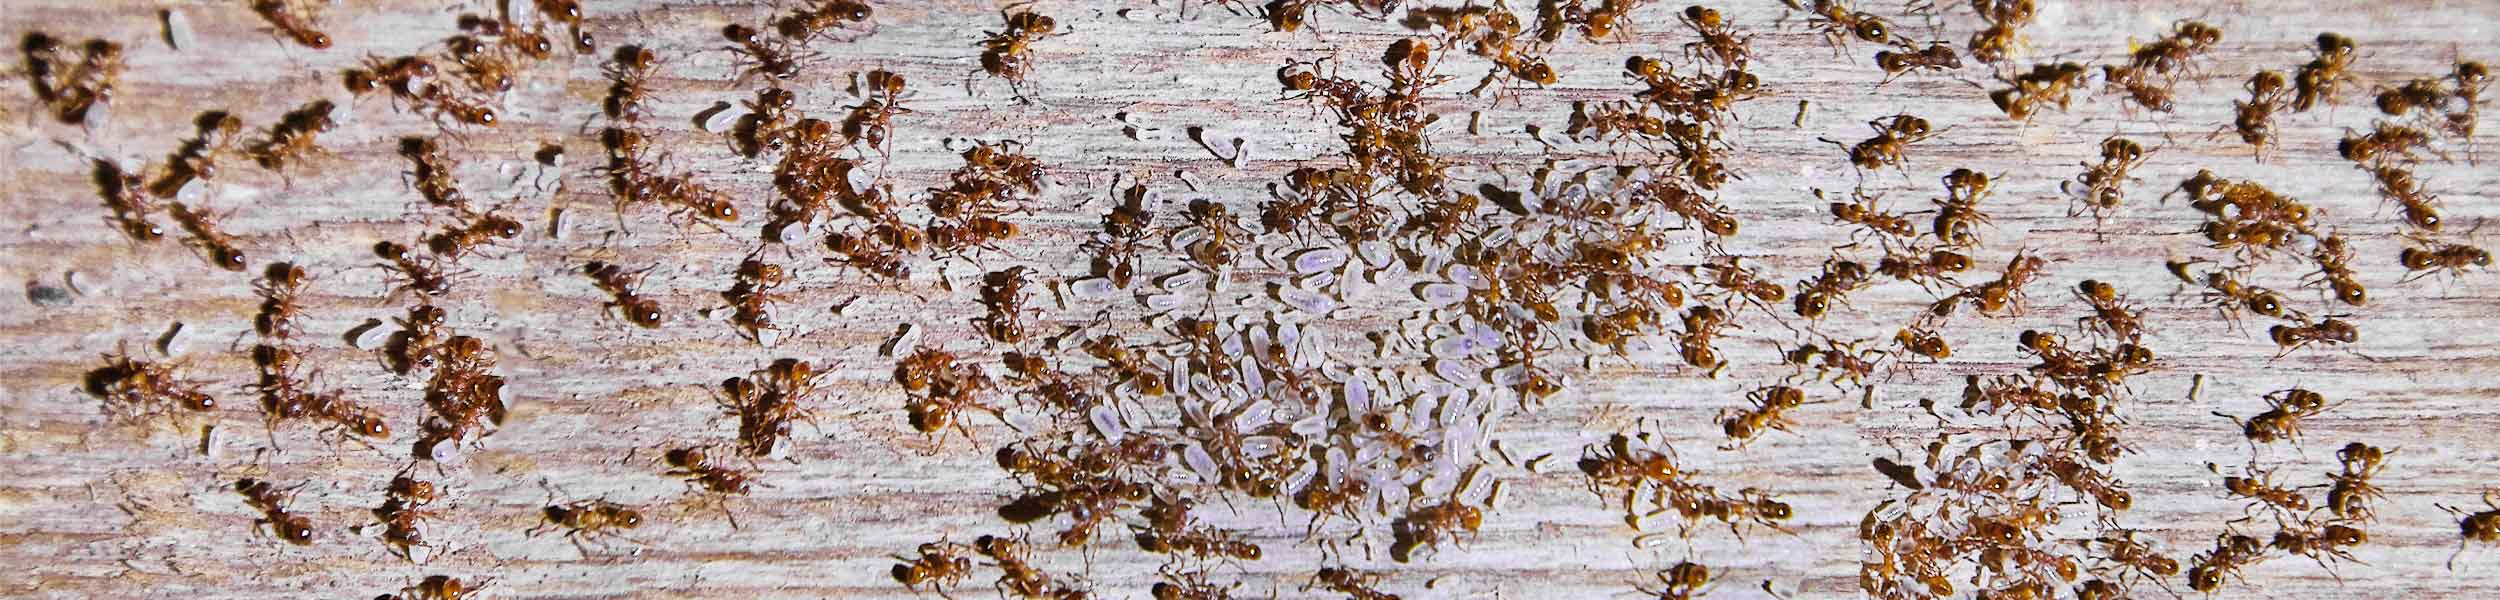 ACE Exterminating-Pest-Control-Ants-Swarm-Light-Header